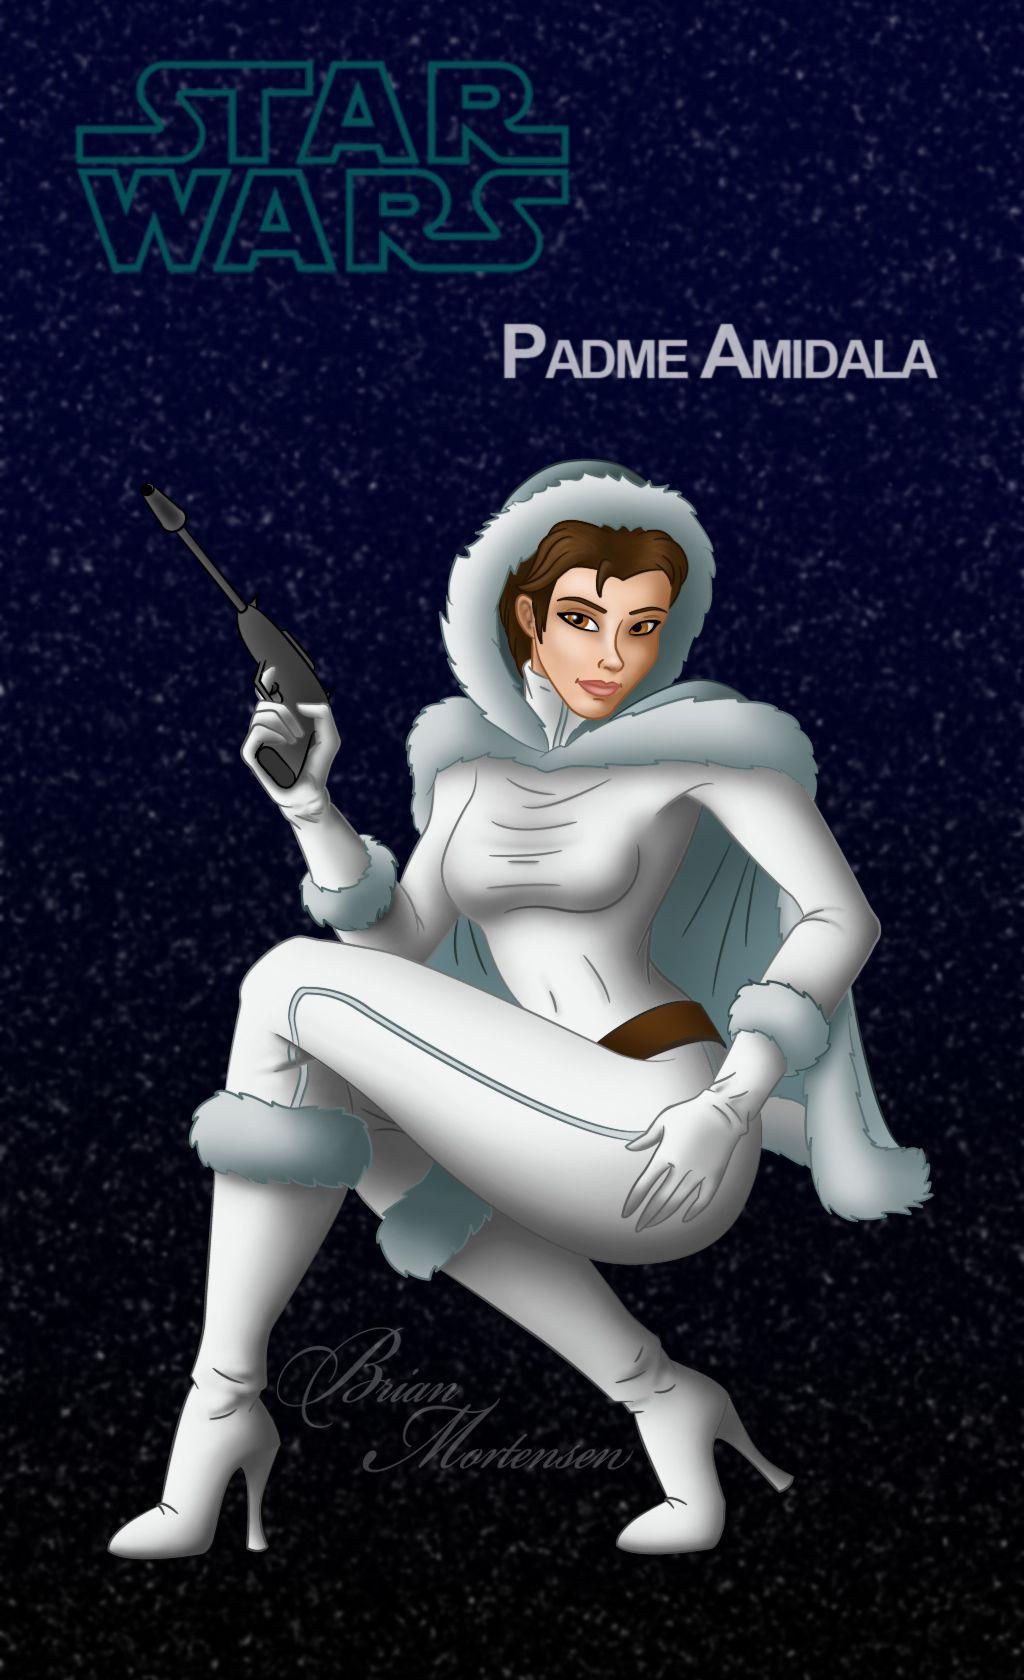 Padme Amidala by breyean